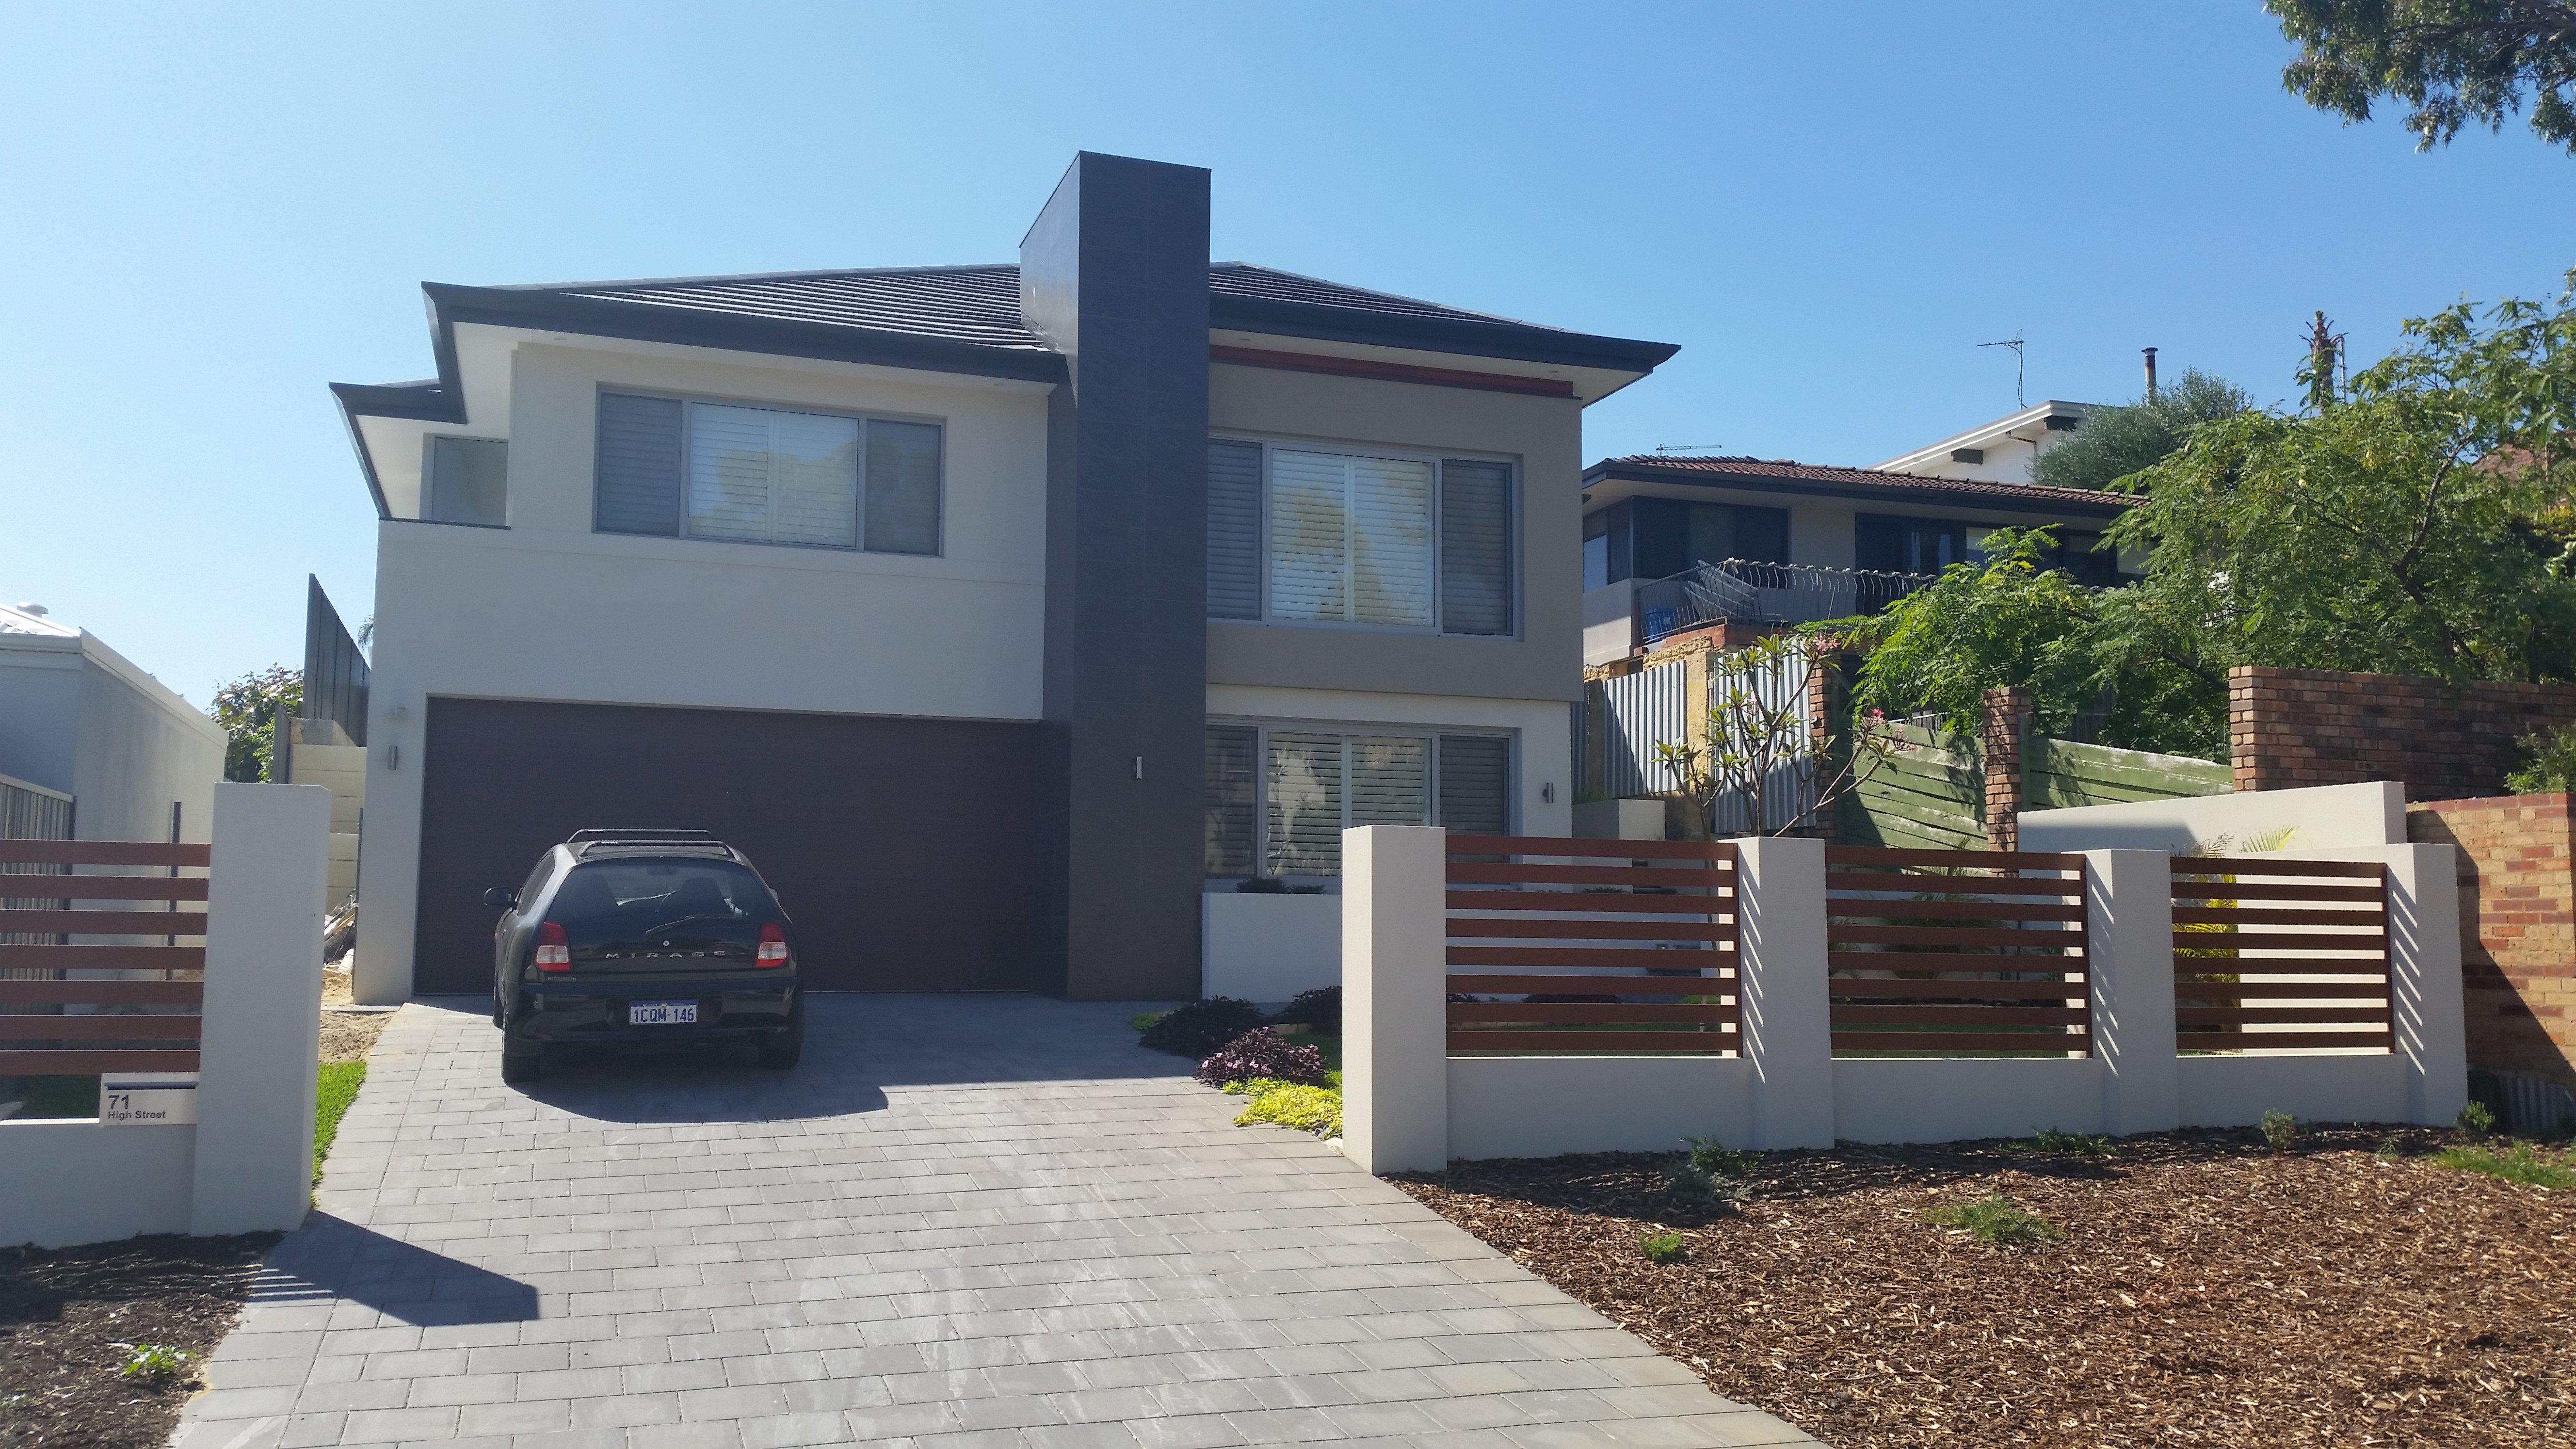 Undercroft Garages - Design & Construct Residential